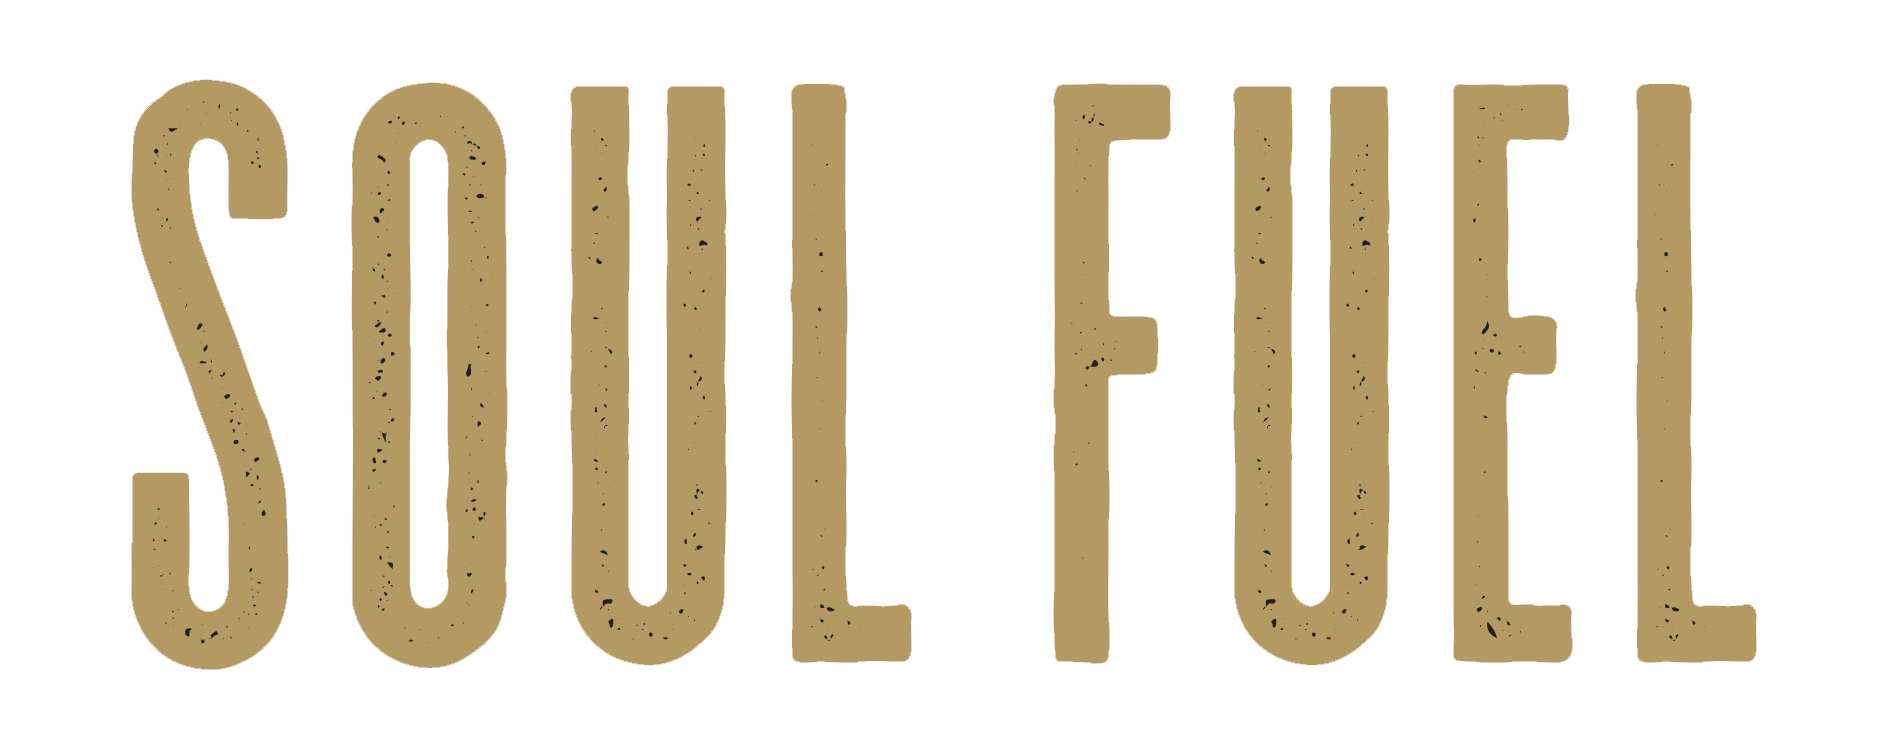 SoulFuel_title1